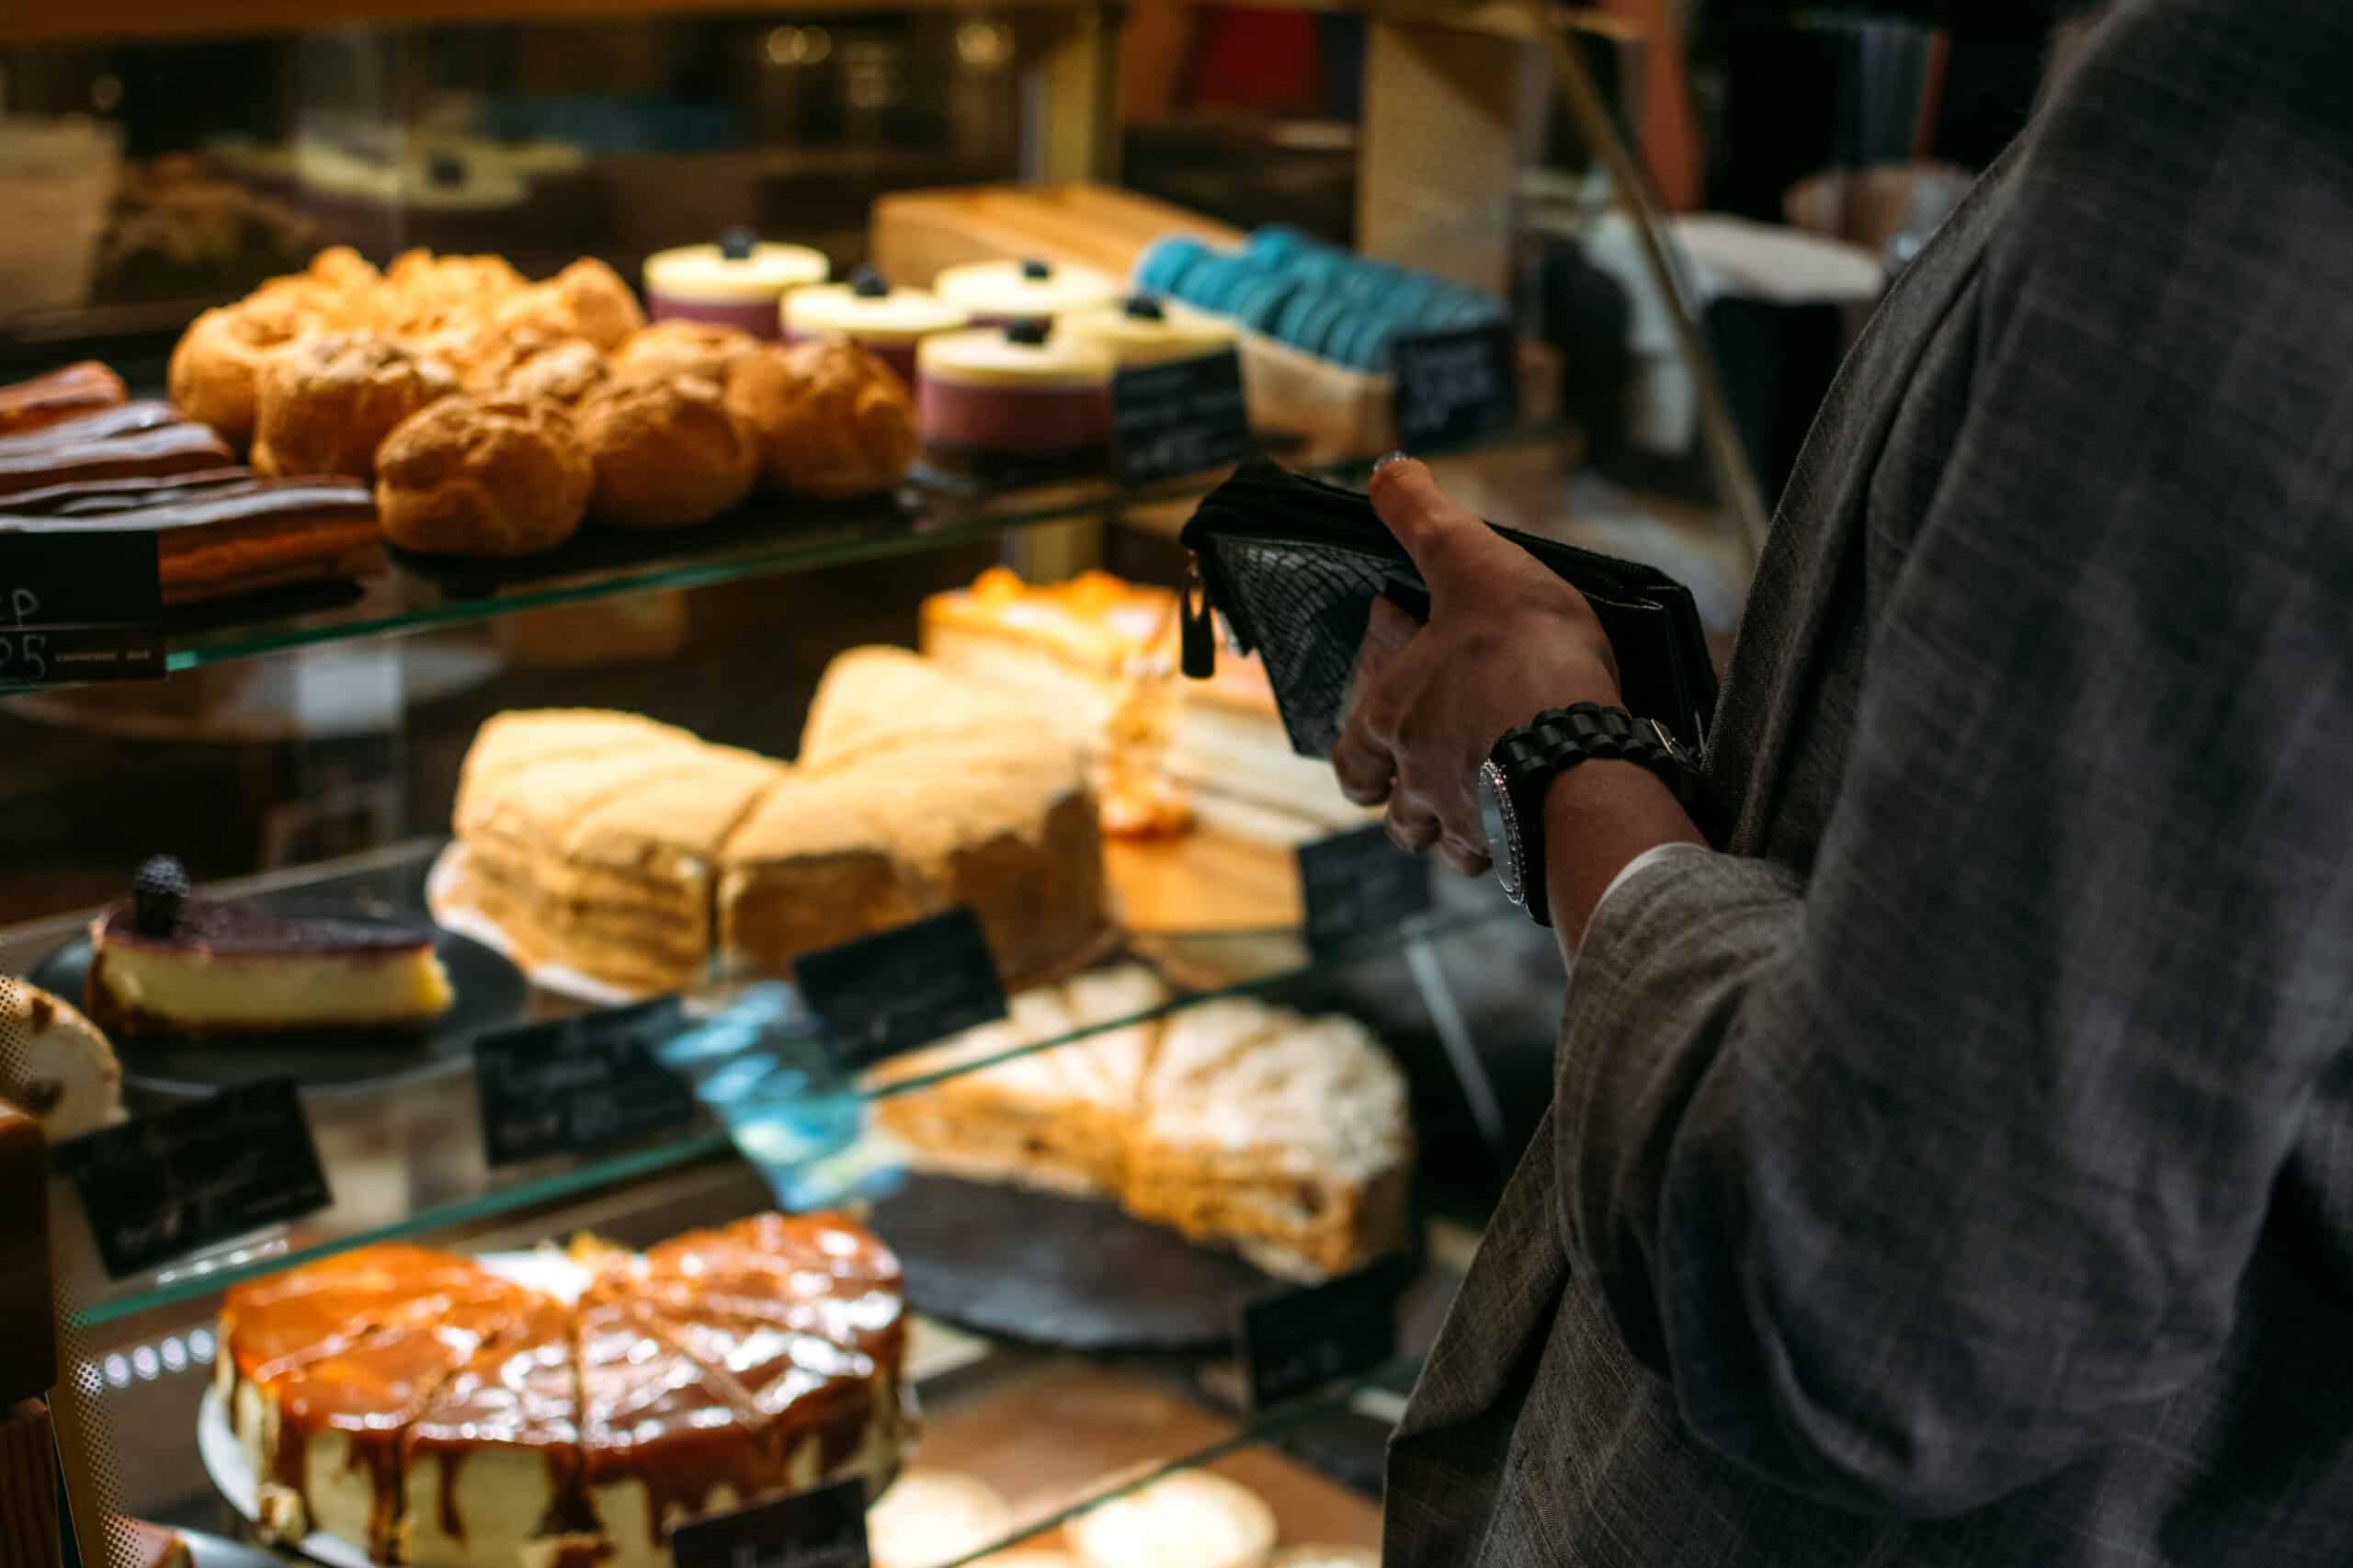 Best Bakery Display Case Ideas